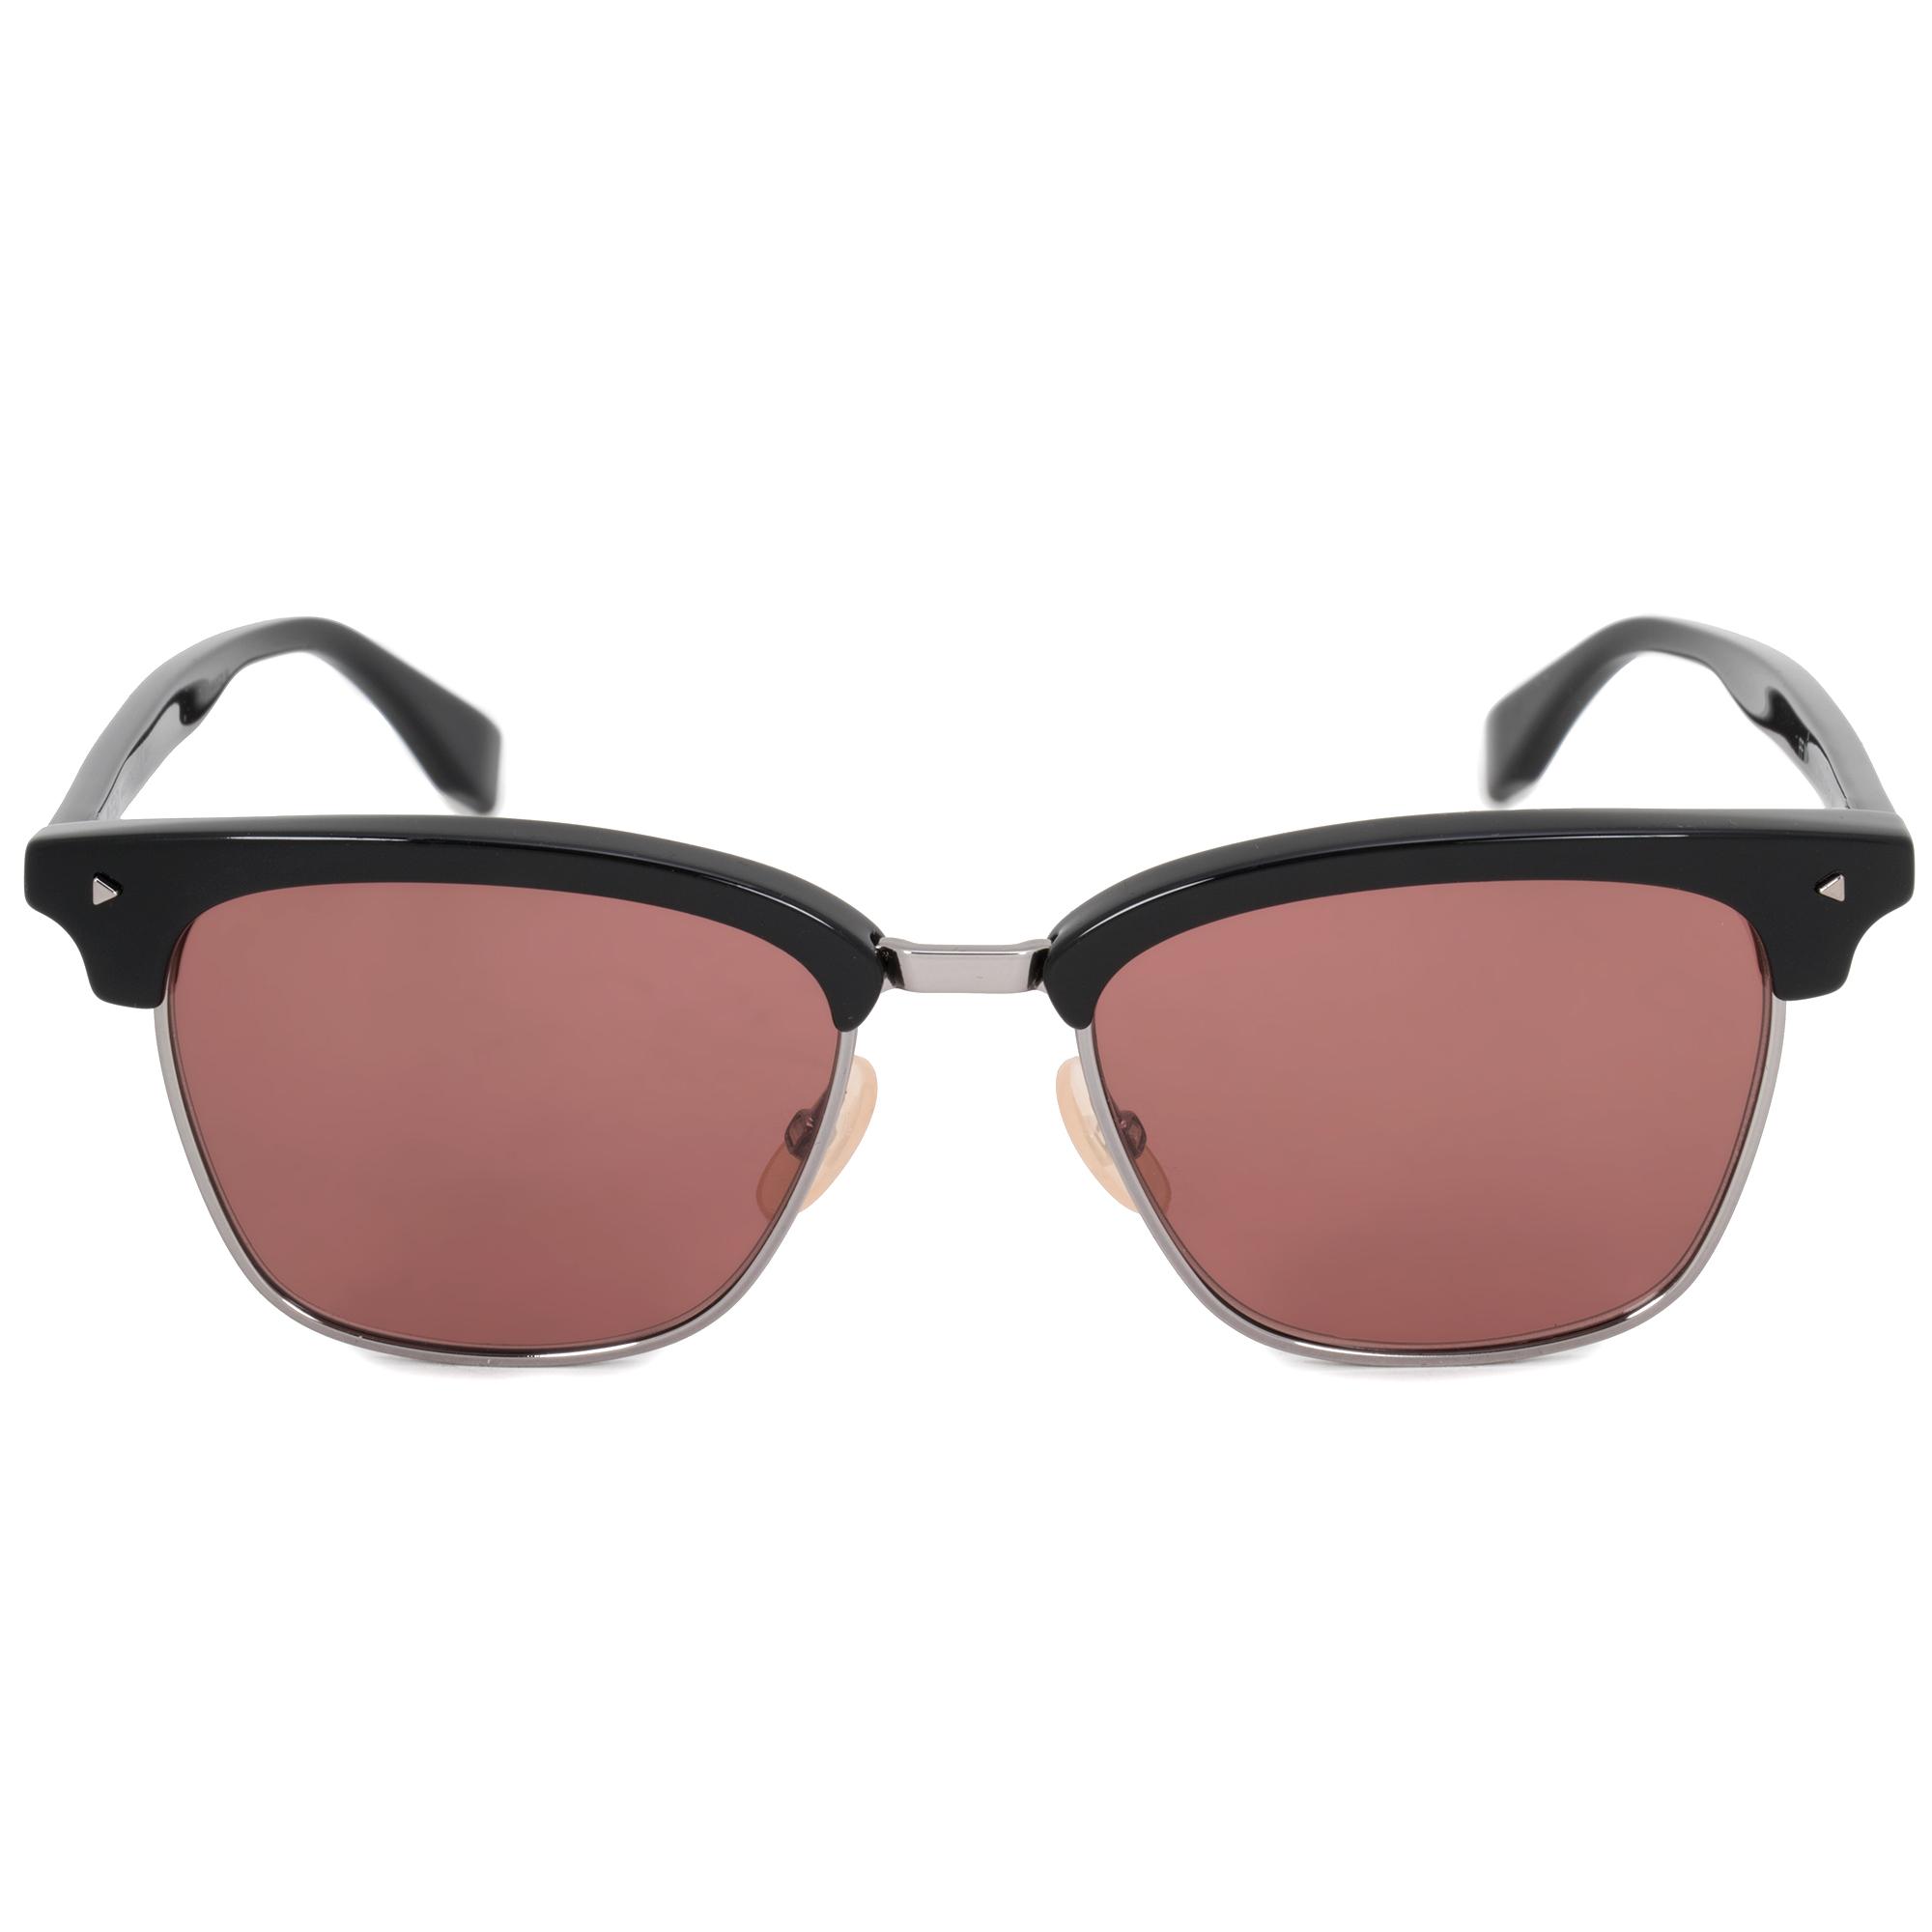 7b1c412a5f Fendi Browline FFM0003S 807 4S 52 Rectangle Sunglasses 762753022479 ...